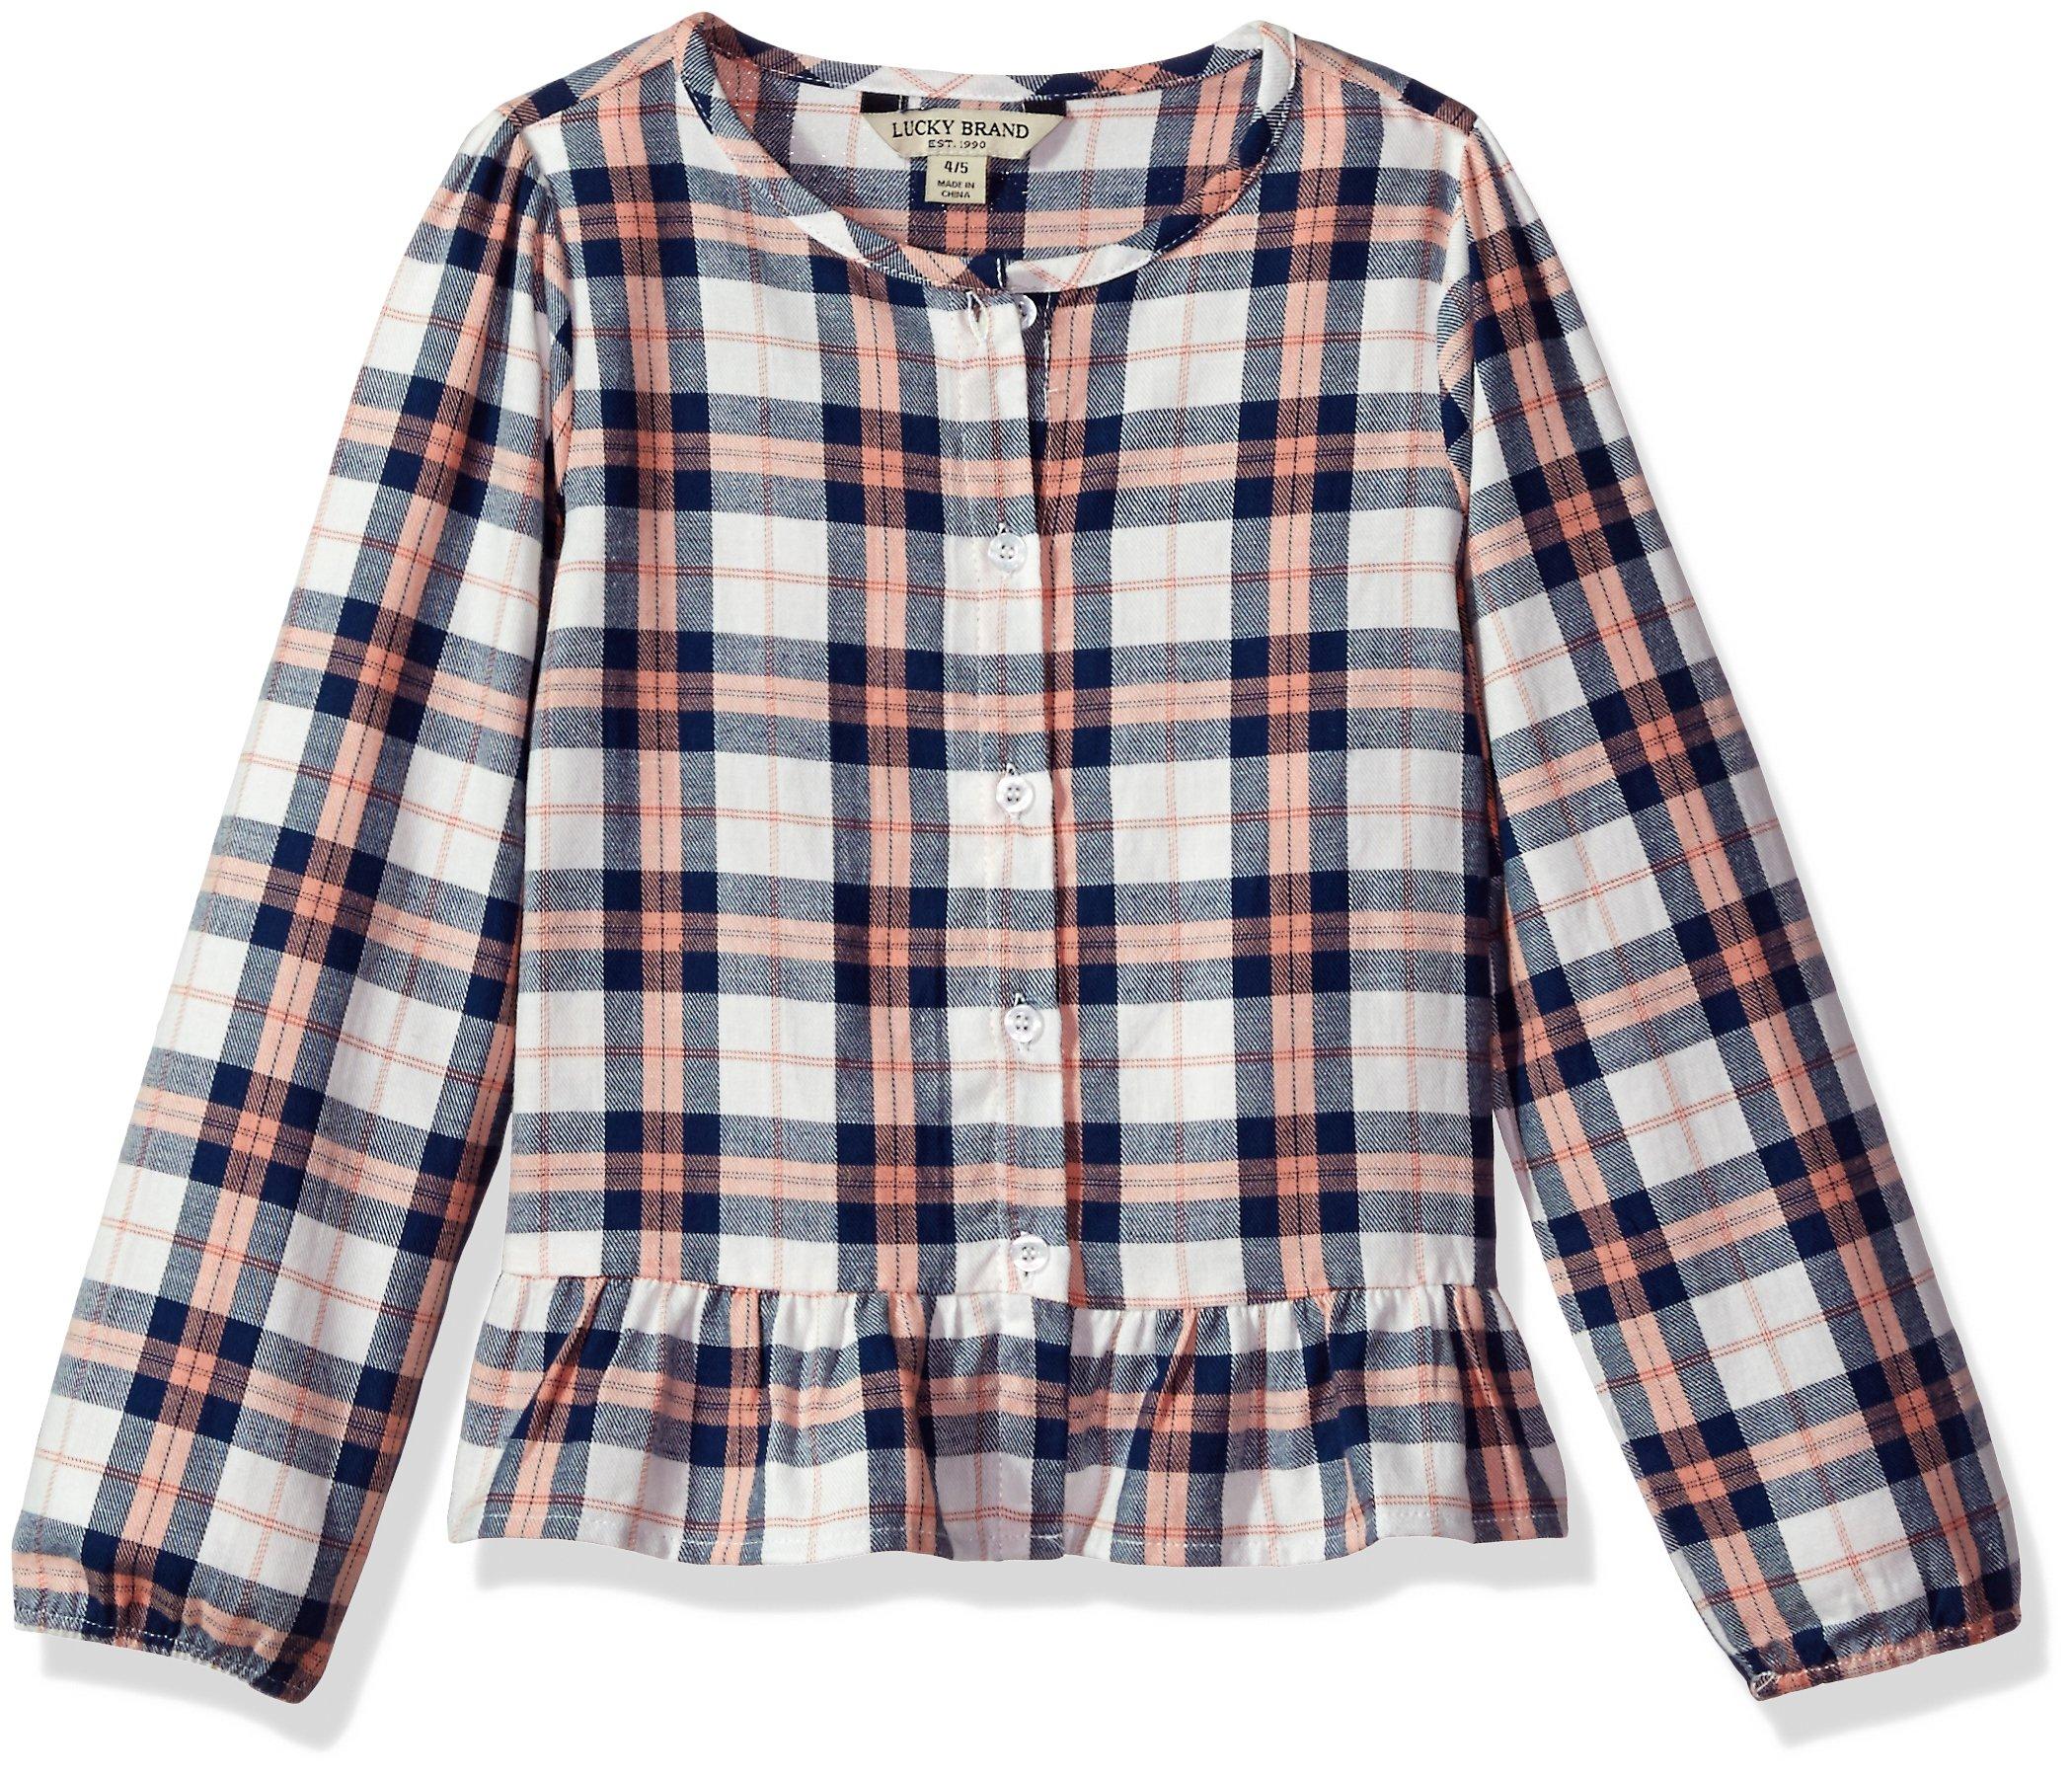 Lucky Brand Big Girls' Long Sleeve Fashion Top, Parker Whisper White, Medium (8/10)